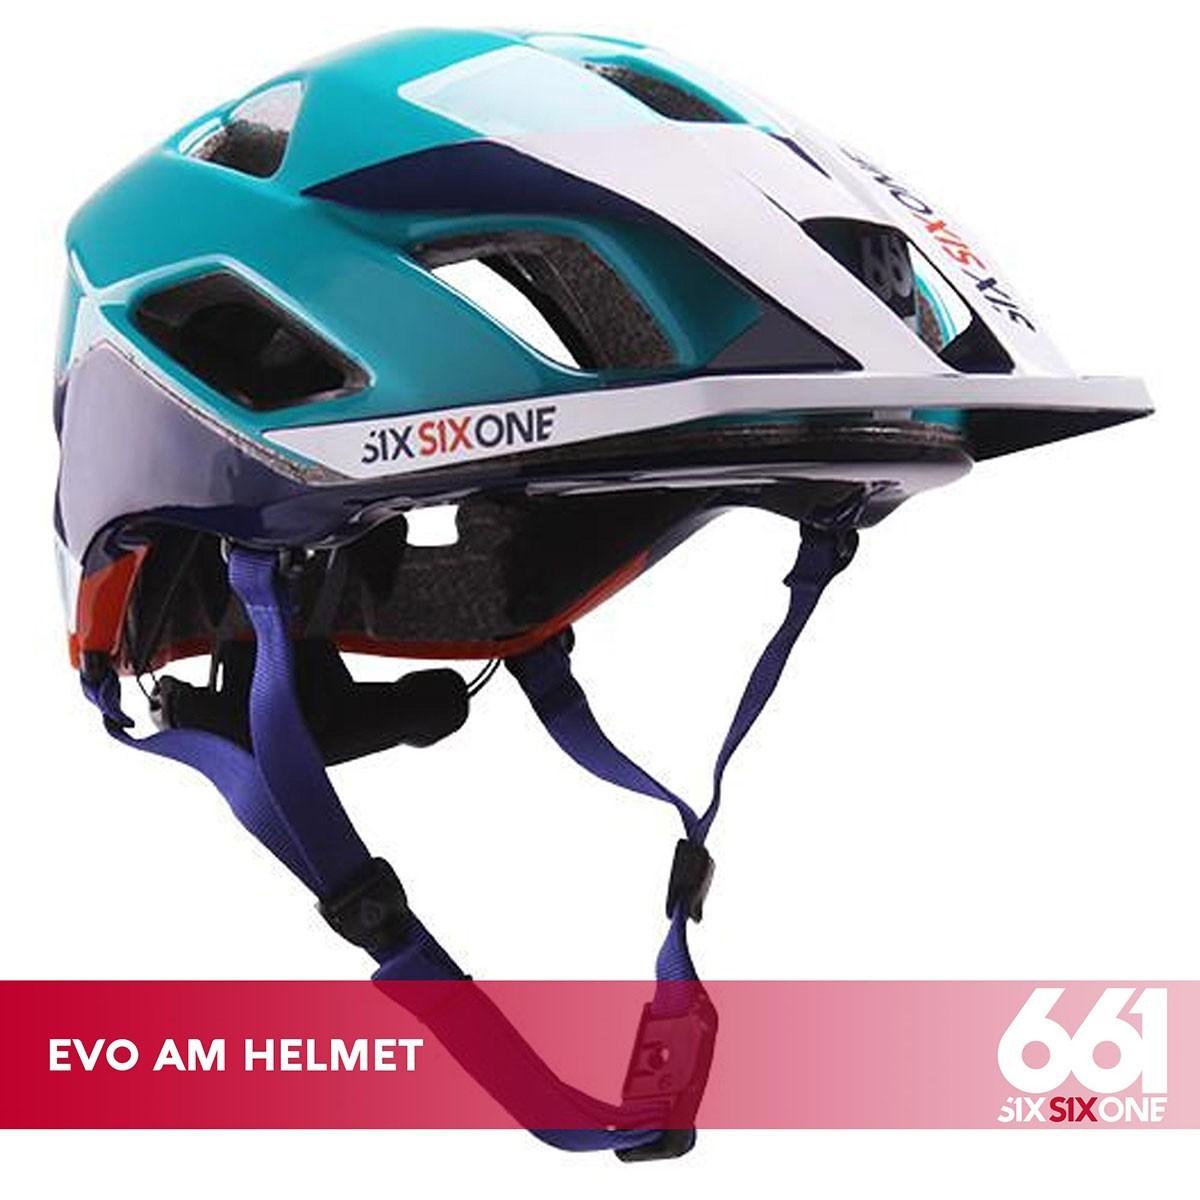 661 EVO AM CE ORANGE BLUE - Изображение - AQUAMATRIX